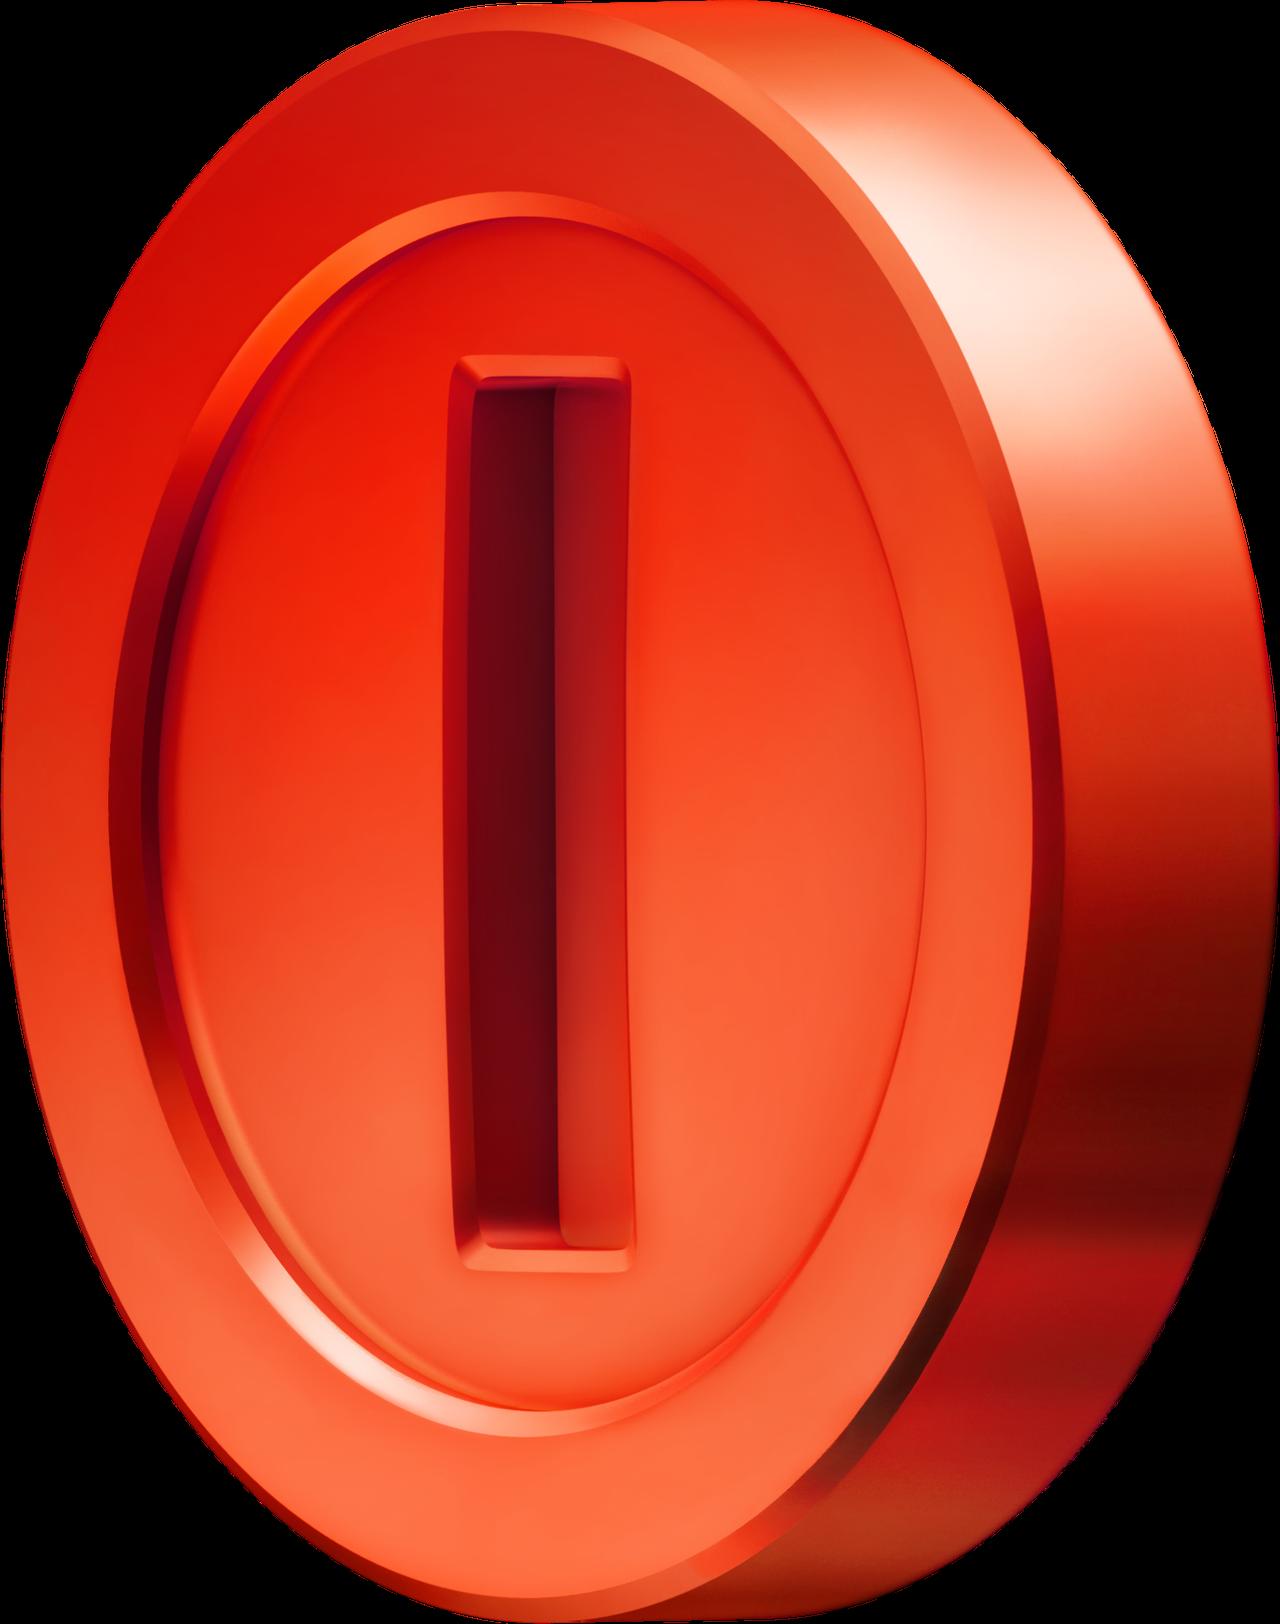 Mario 3d 2-1 star coins : Ebay coins canada questions